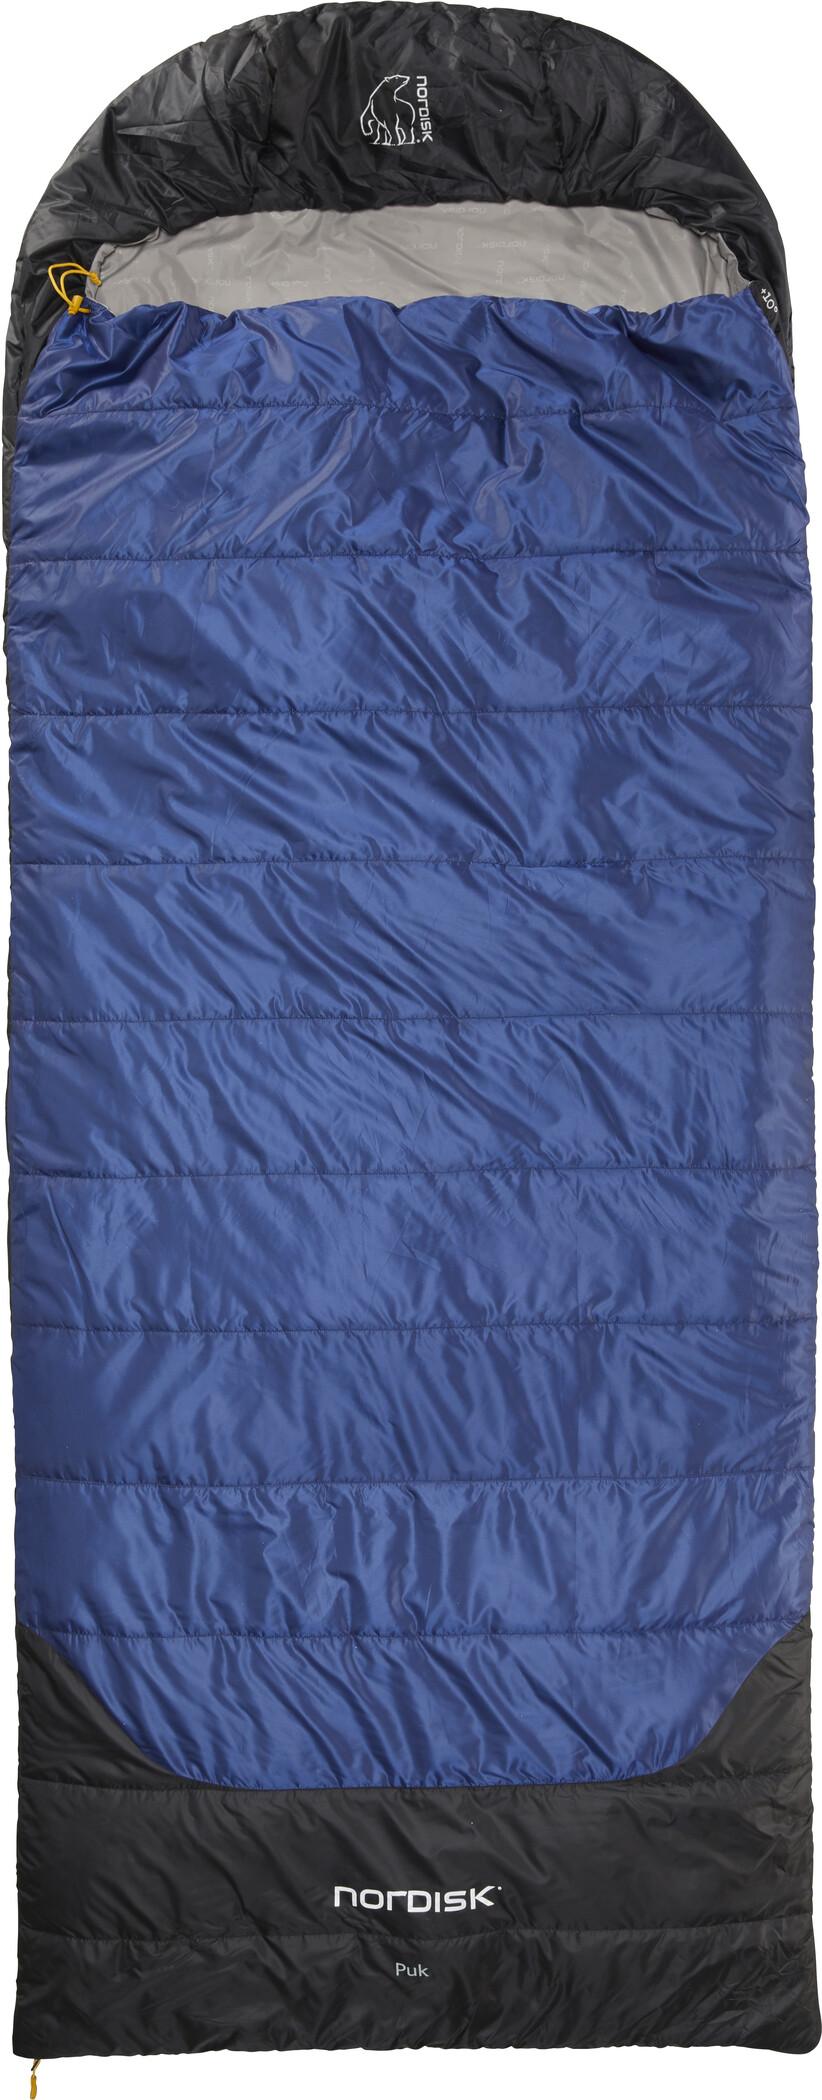 Nordisk Puk +10° Blanket Sovepose XL, true navy/steeple gray/black (2019) | Misc. Transportation and Storage